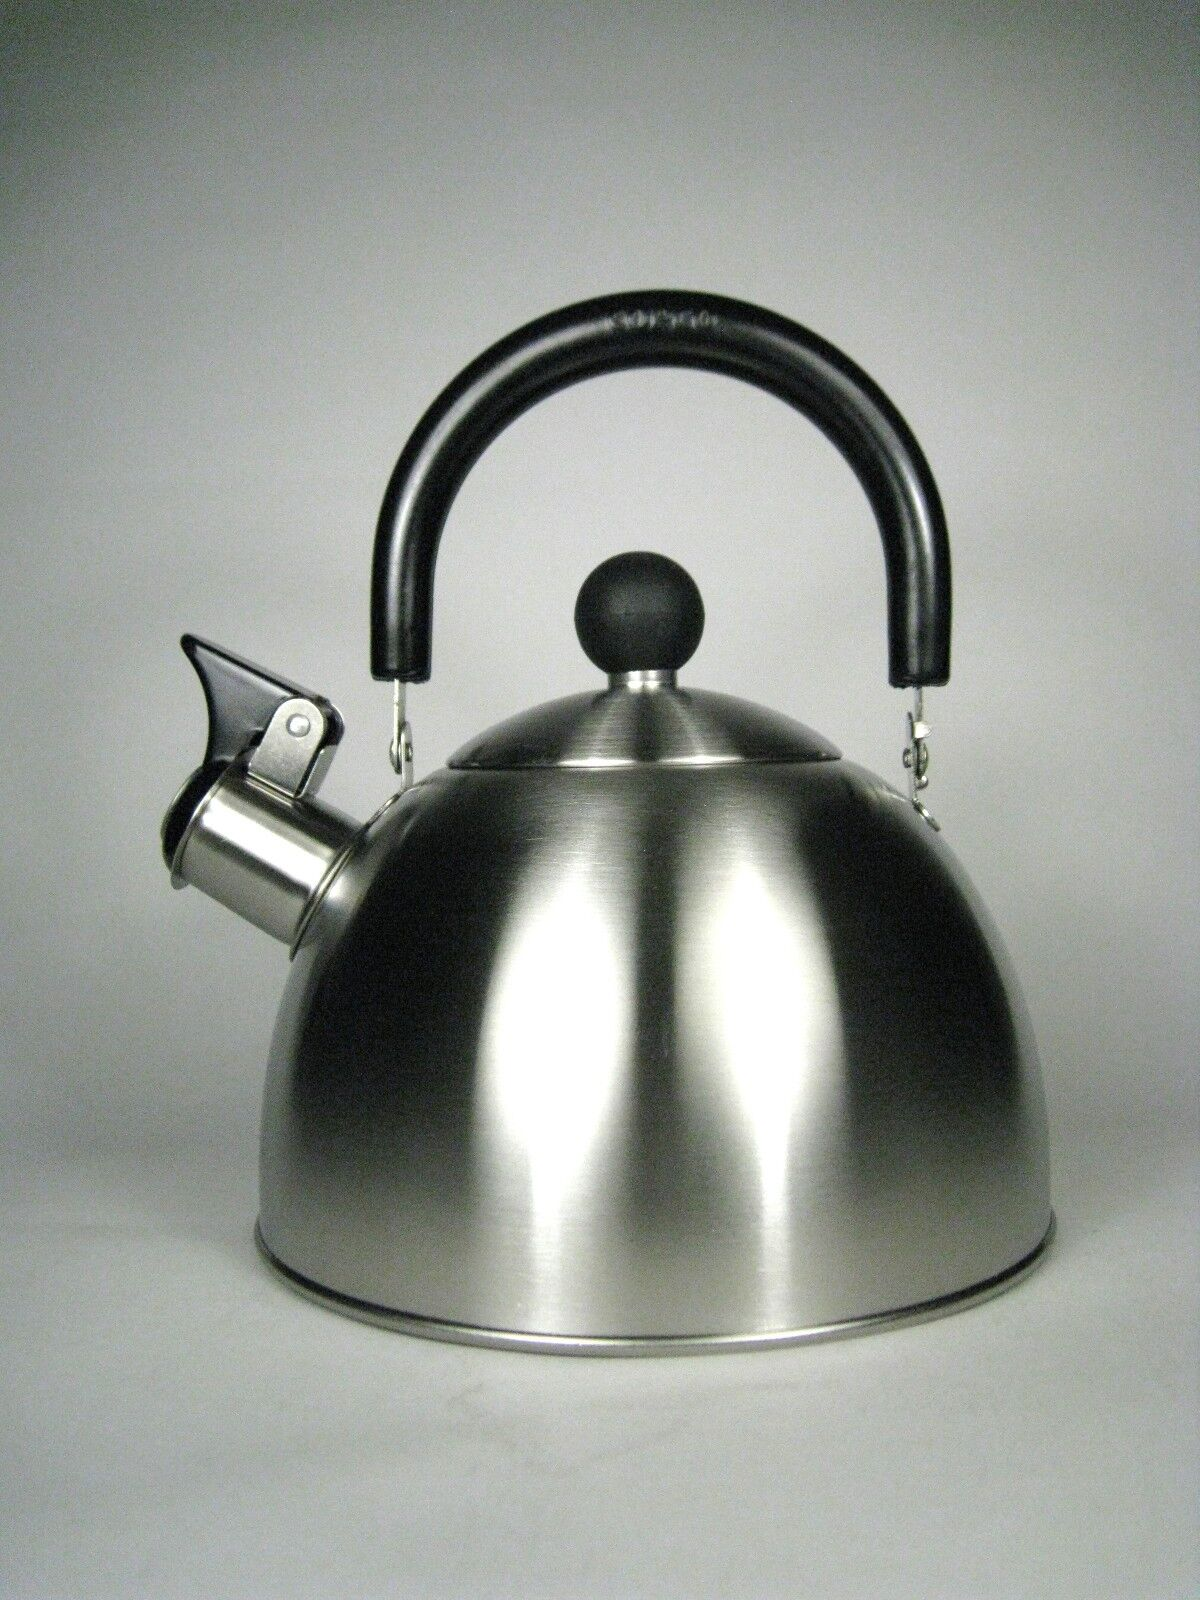 Copco 2503-0300 Kettering Brushed Stainless Steel Tea Kettle